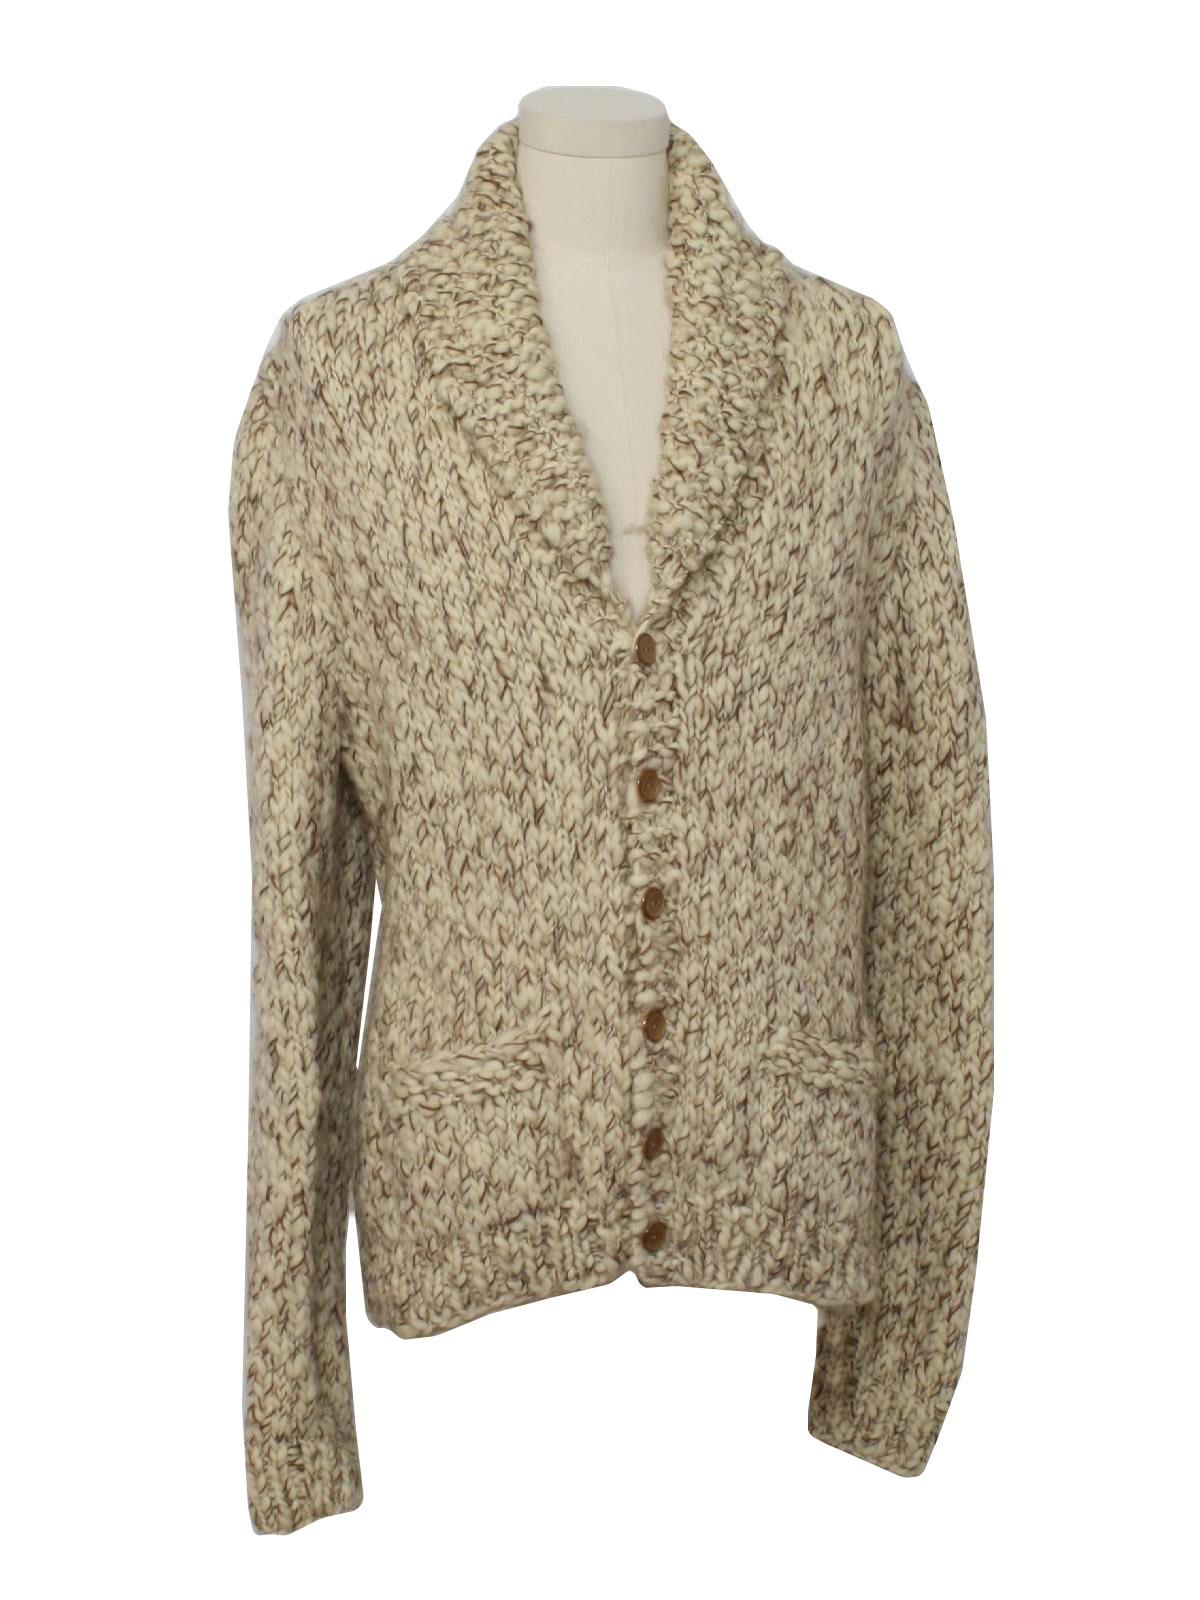 Vintage Inspired Acrylic Fiber Sweater 2diJJkm0h